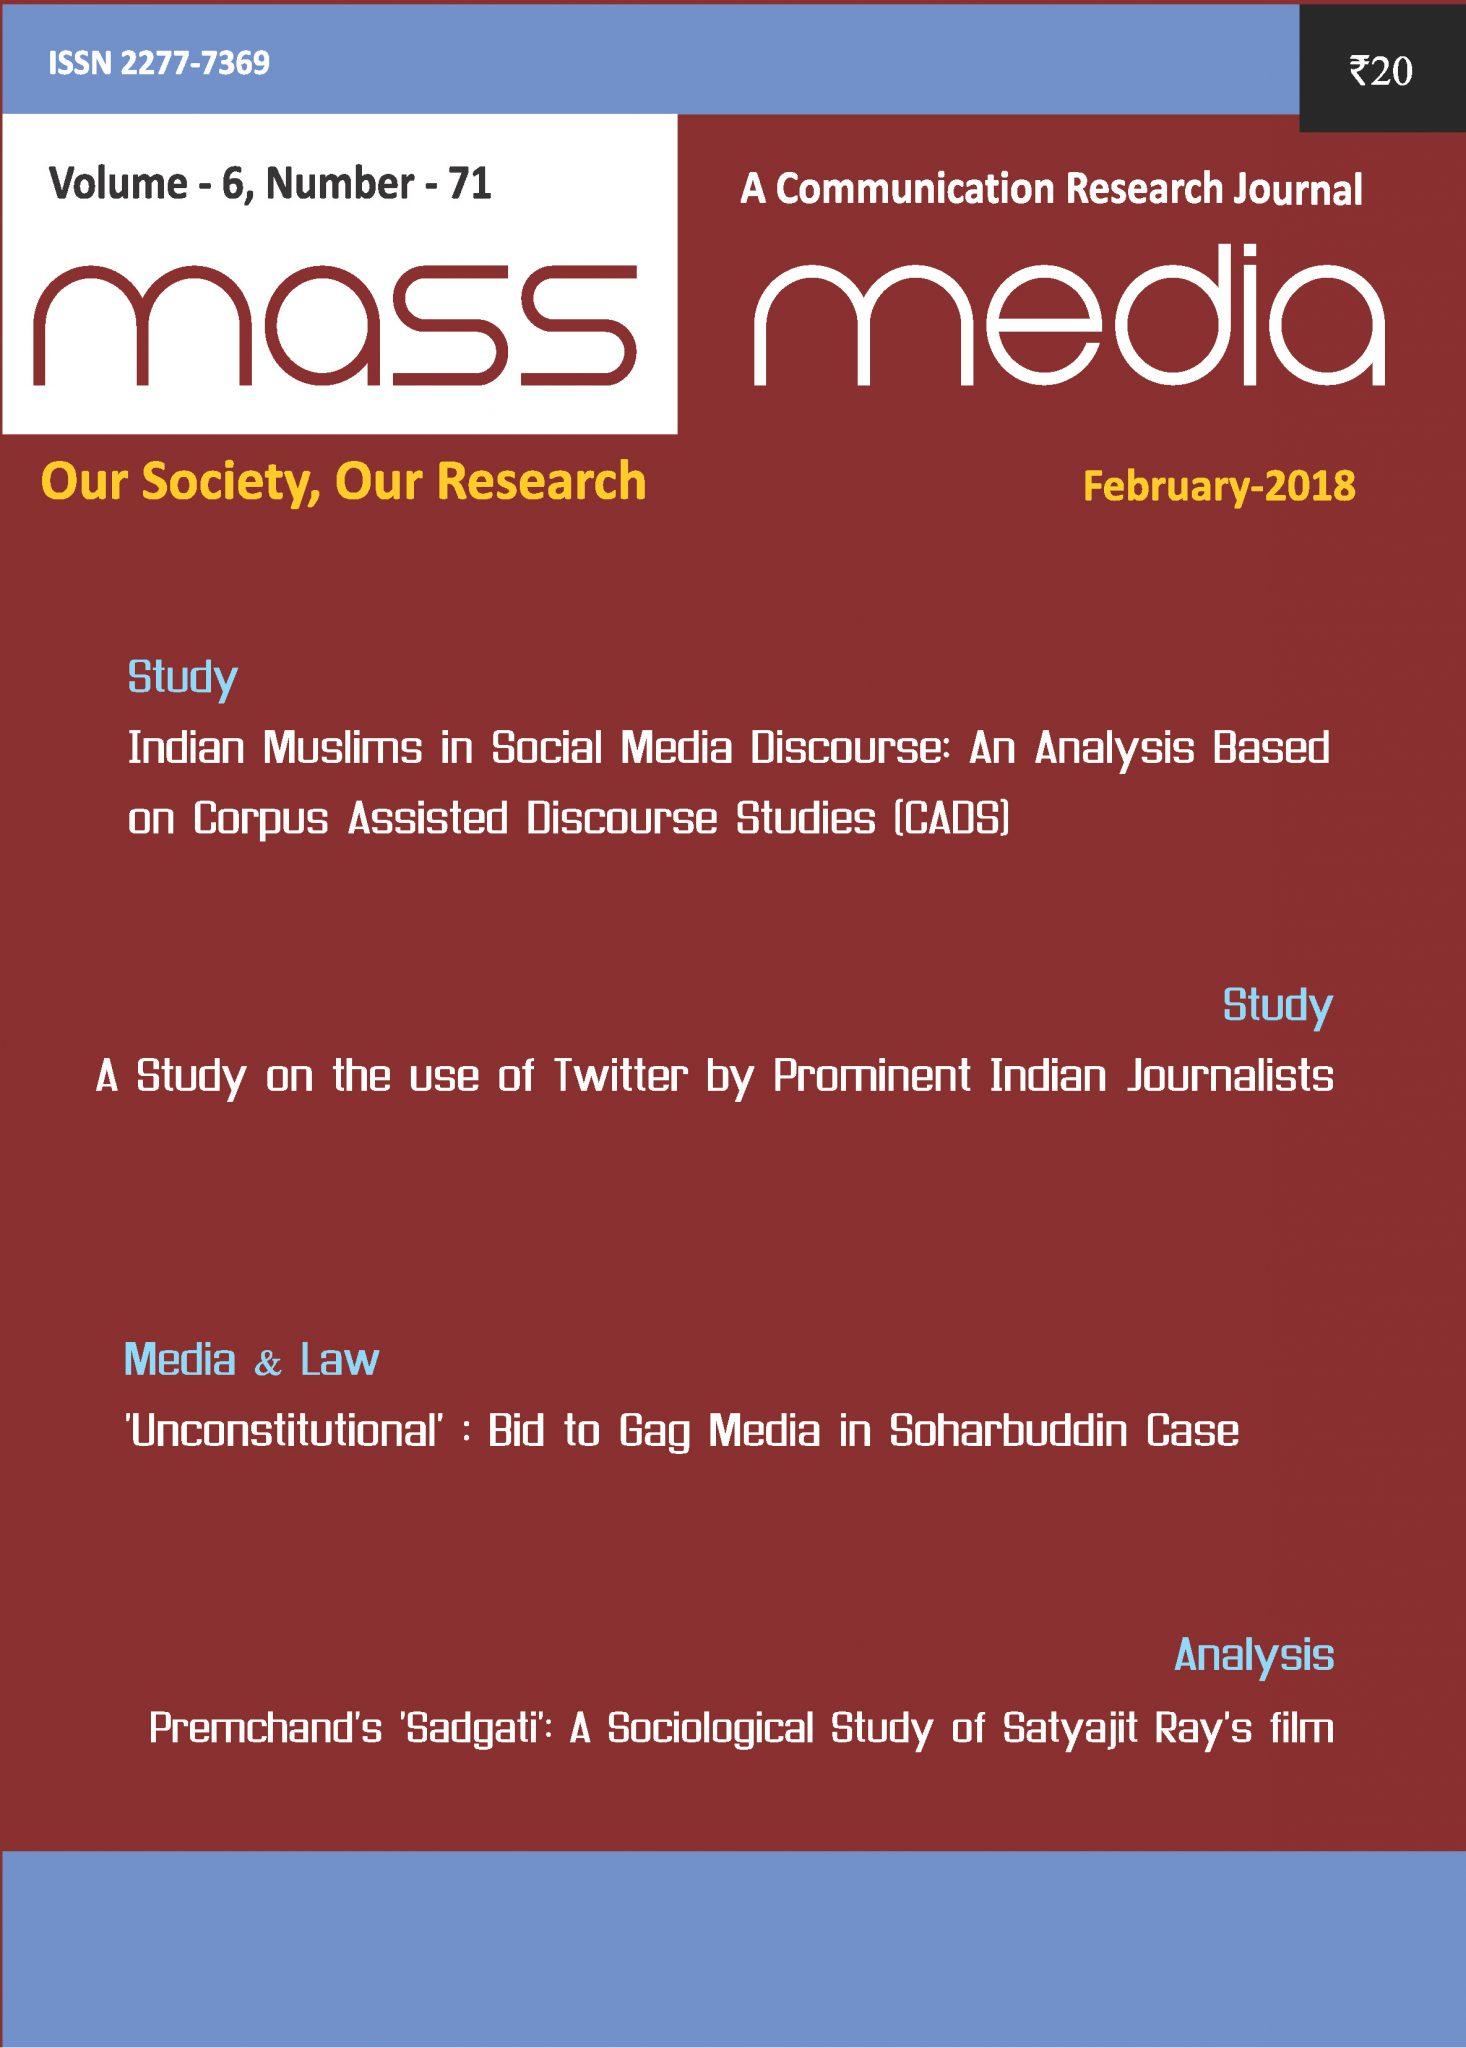 Mass Media (February 2018)